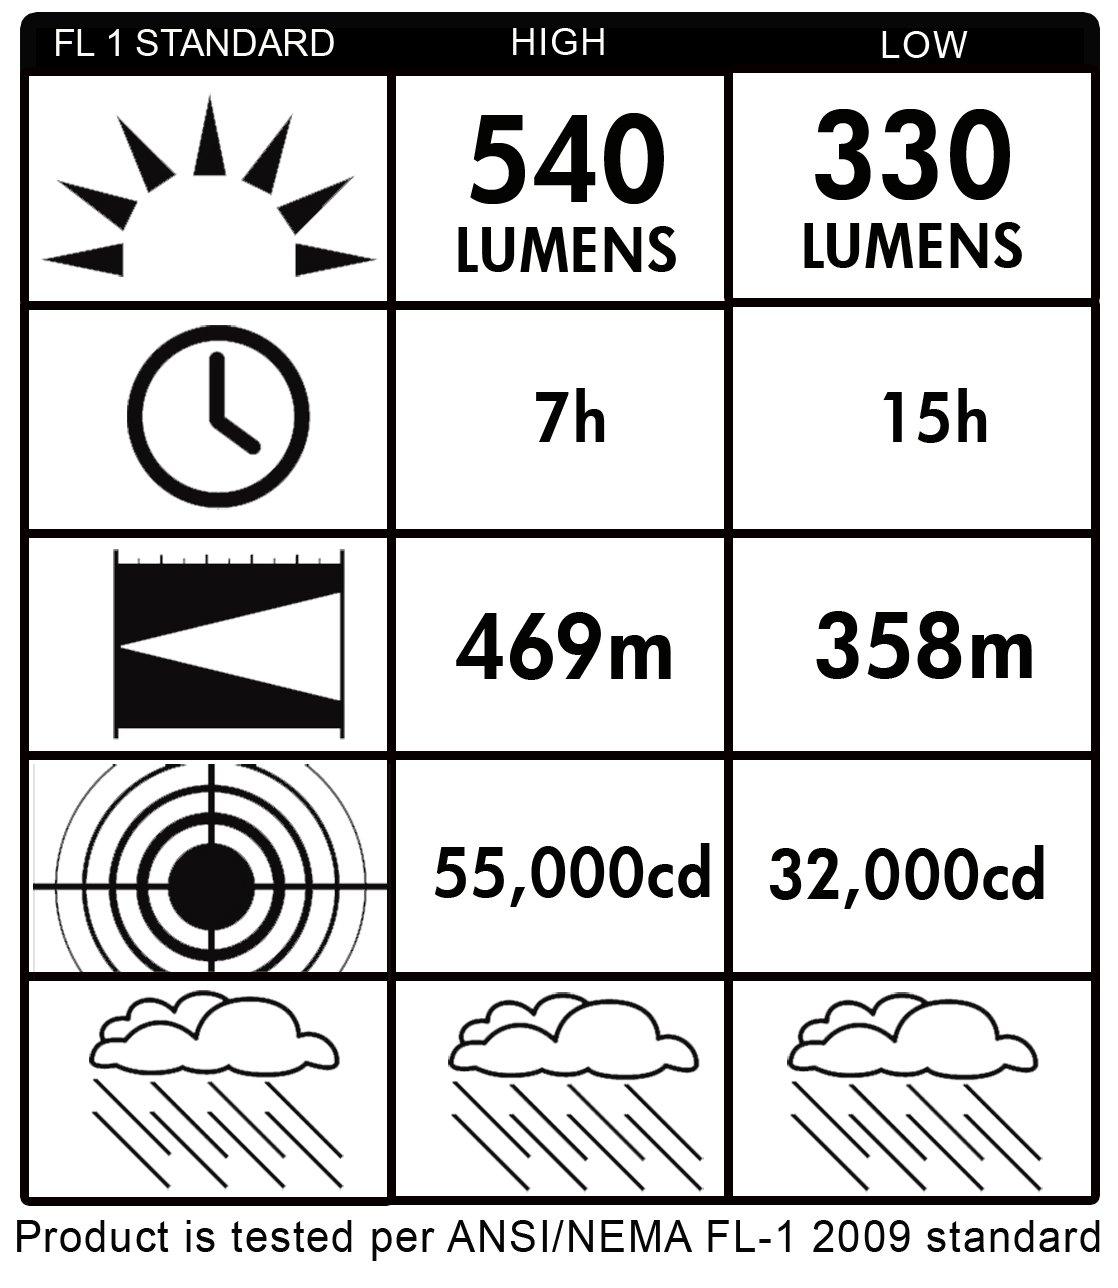 Streamlight 45856 E Spot Litebox Lantern Without Charger Orange 6v Ultrabright Led Chaser Circuit 540 Lumens Basic Handheld Flashlights